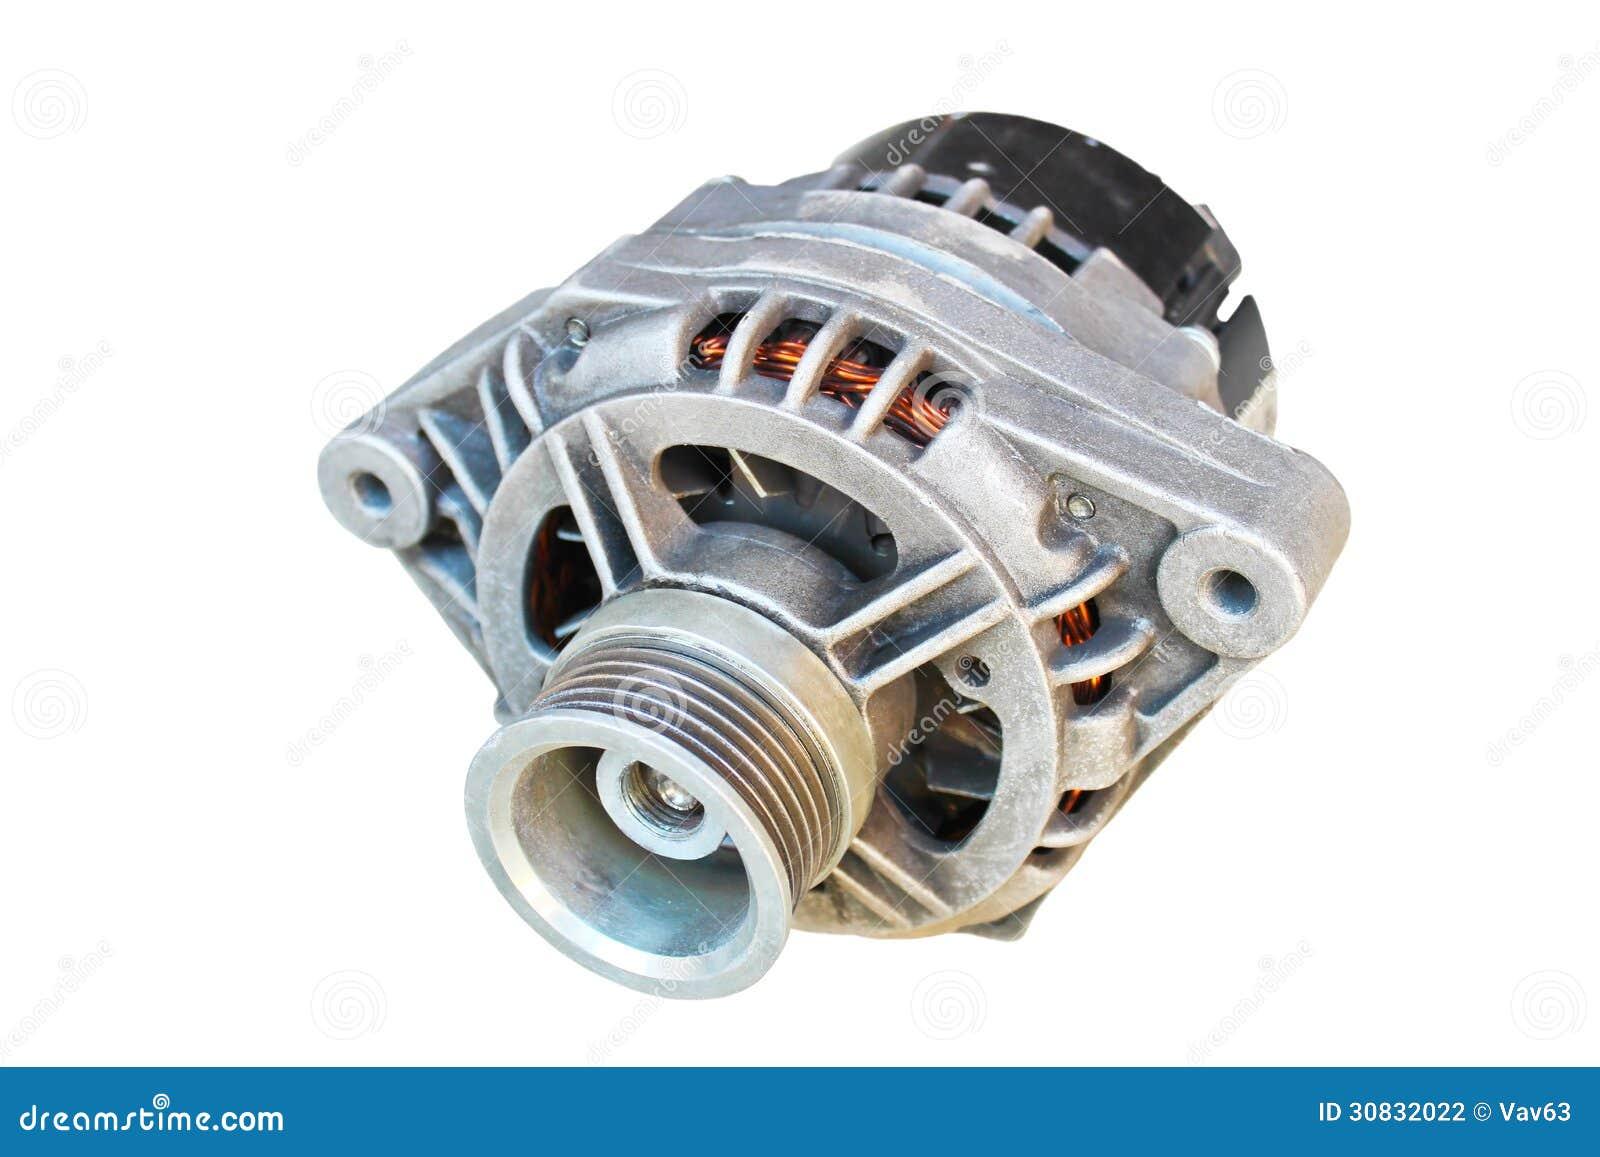 Best Car Alternator Brand